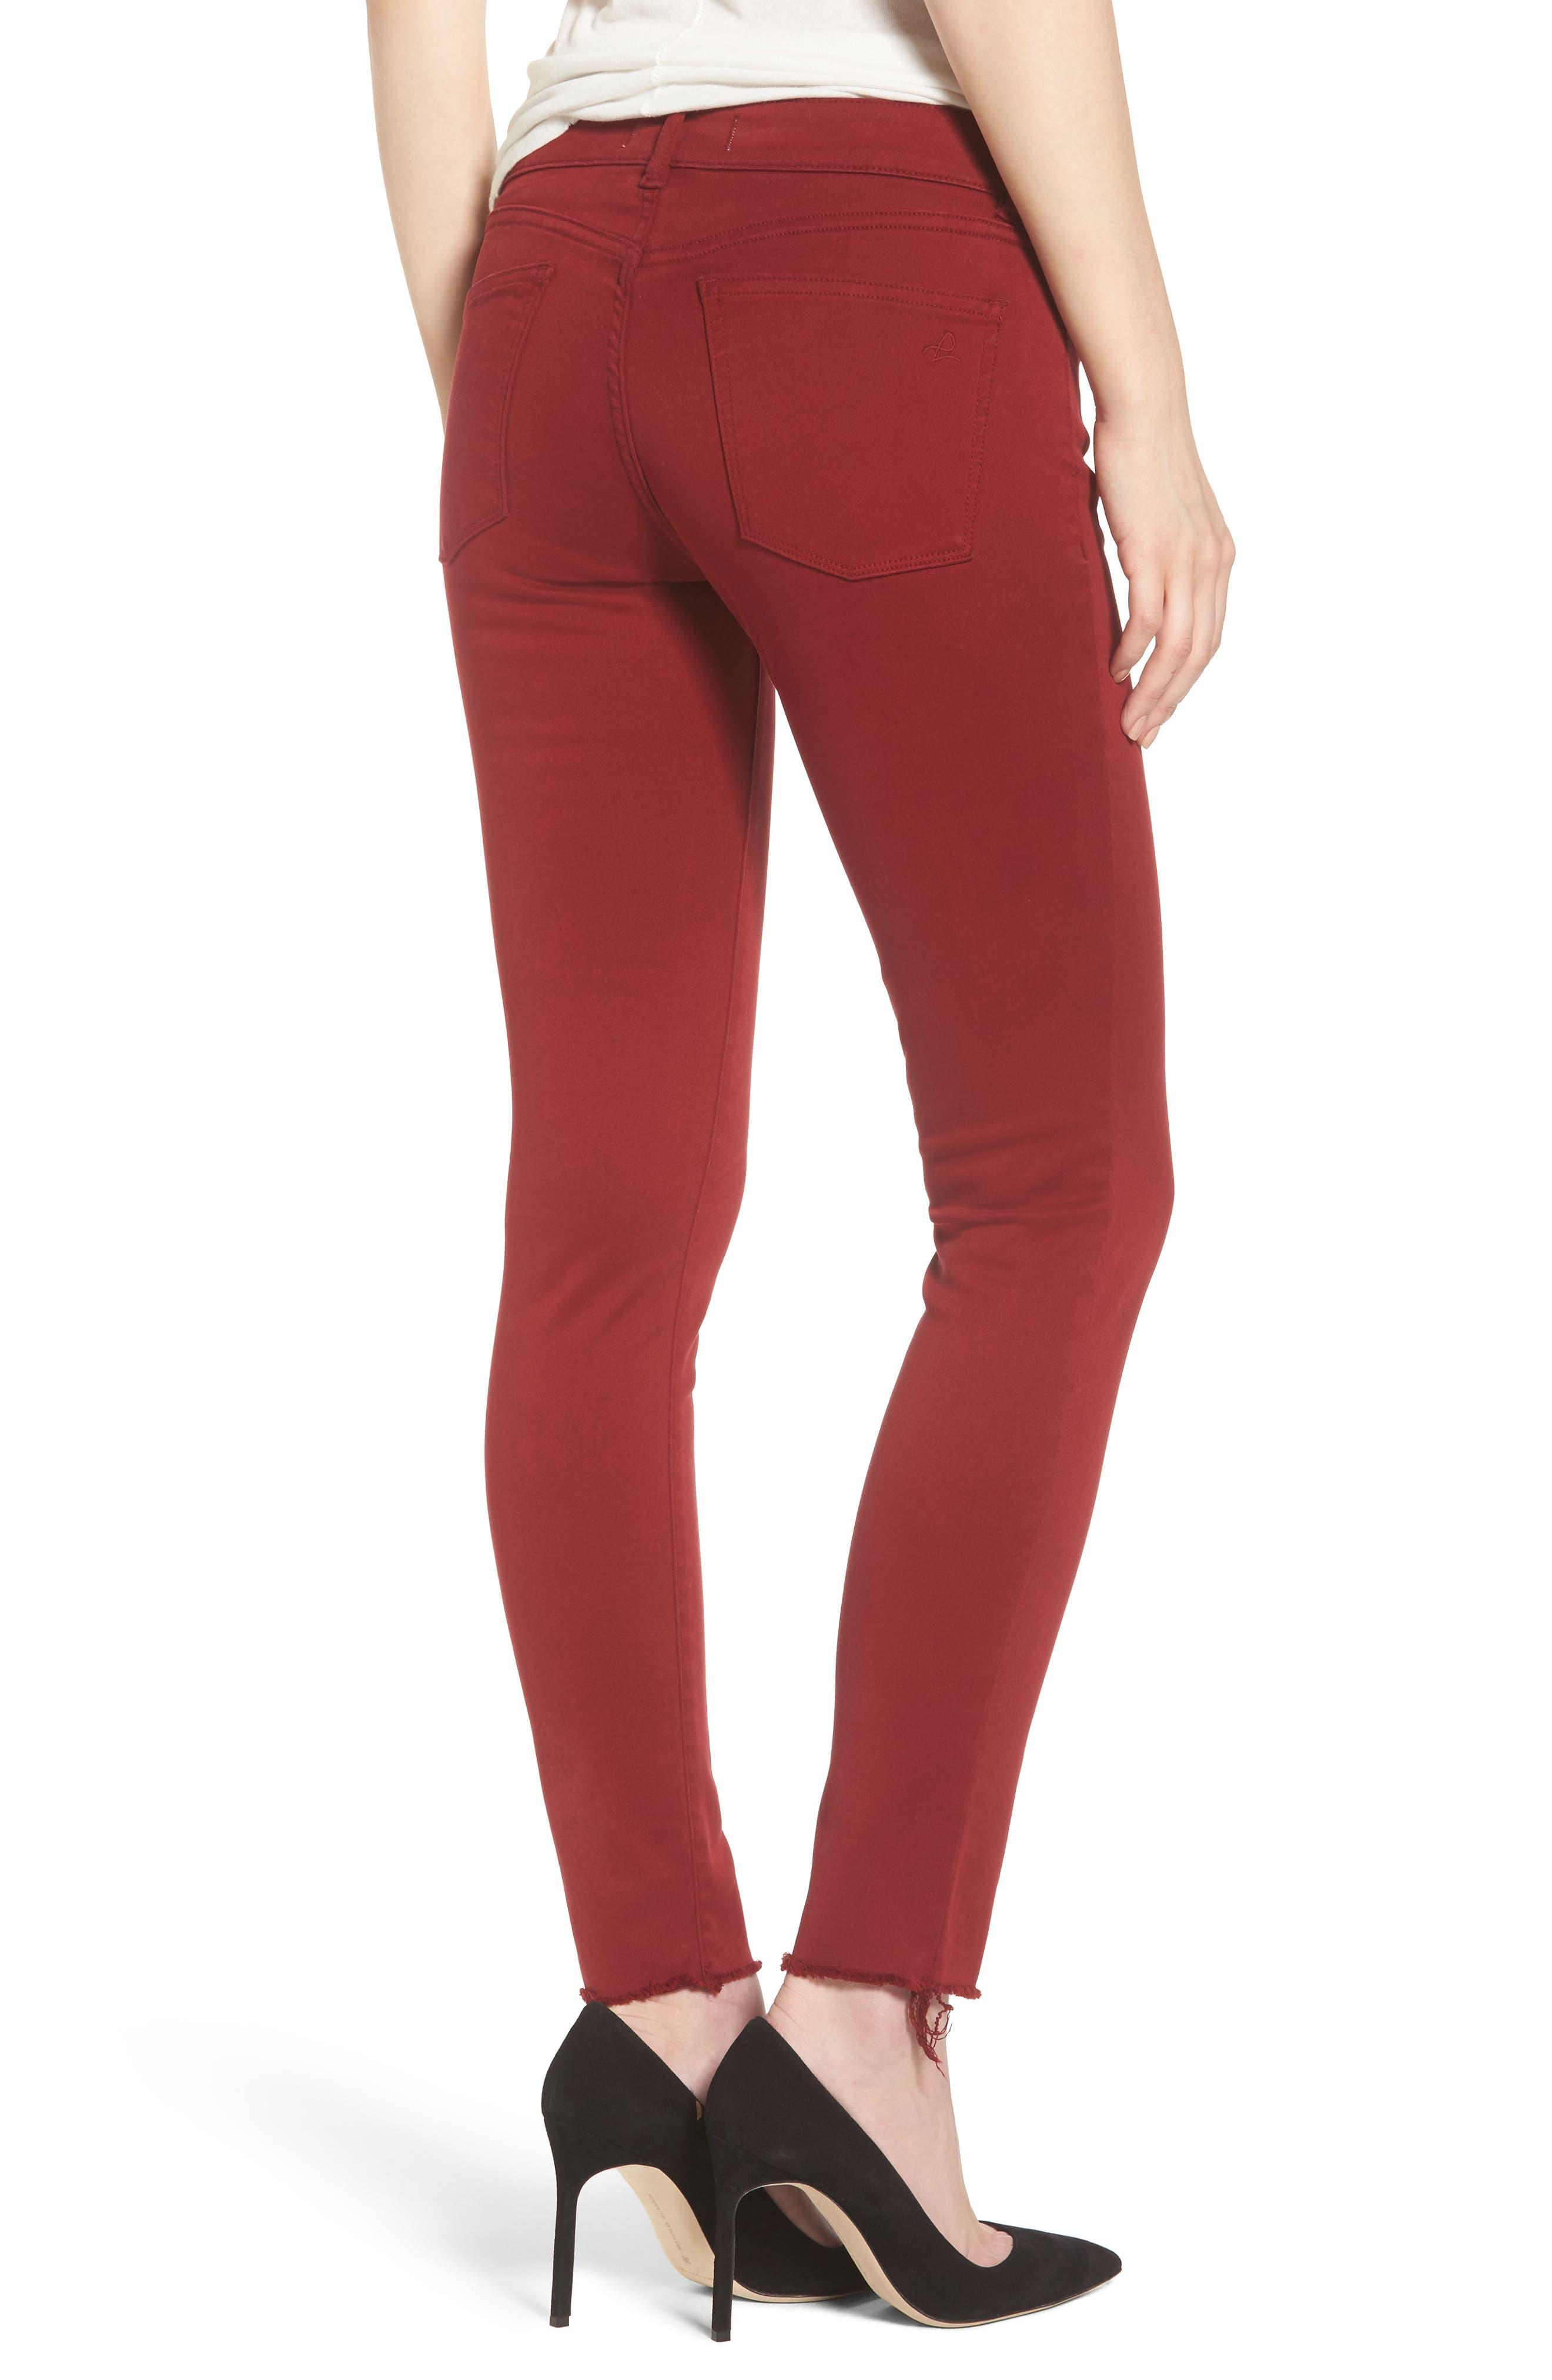 Emma Power Legging Jeans,                             Alternate thumbnail 2, color,                             609